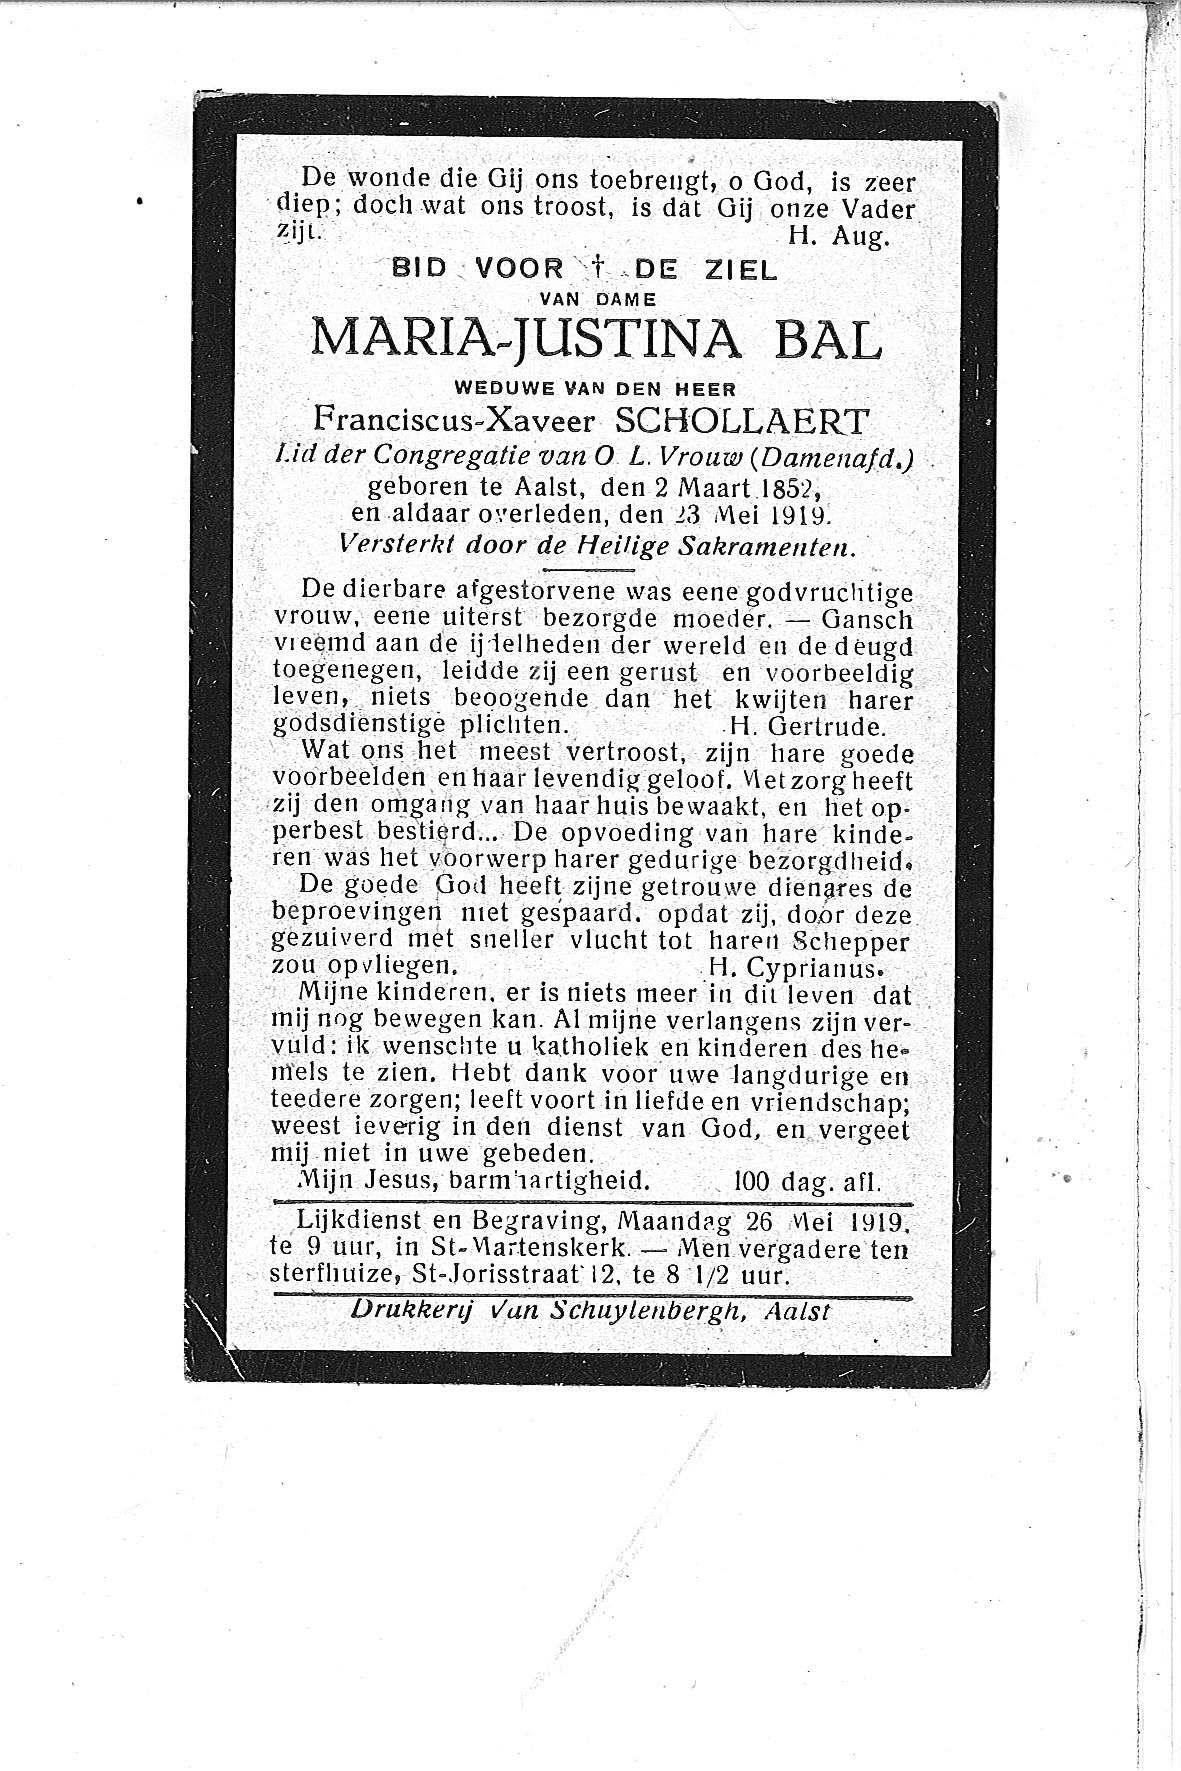 Maria-Justina(1919)20101006151440_00004.jpg